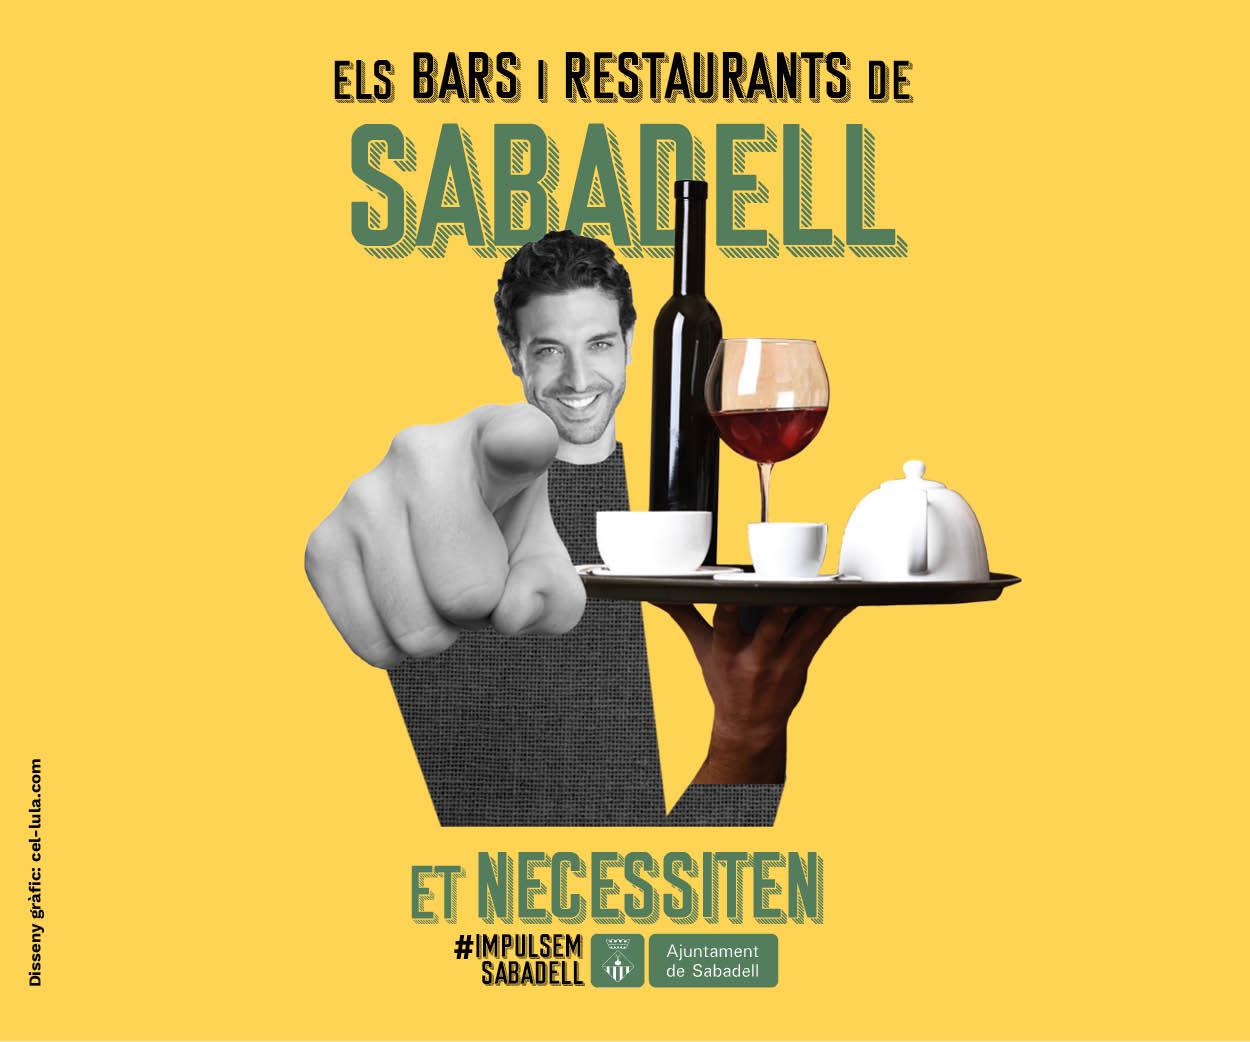 Bars i Restaurants Sabadell